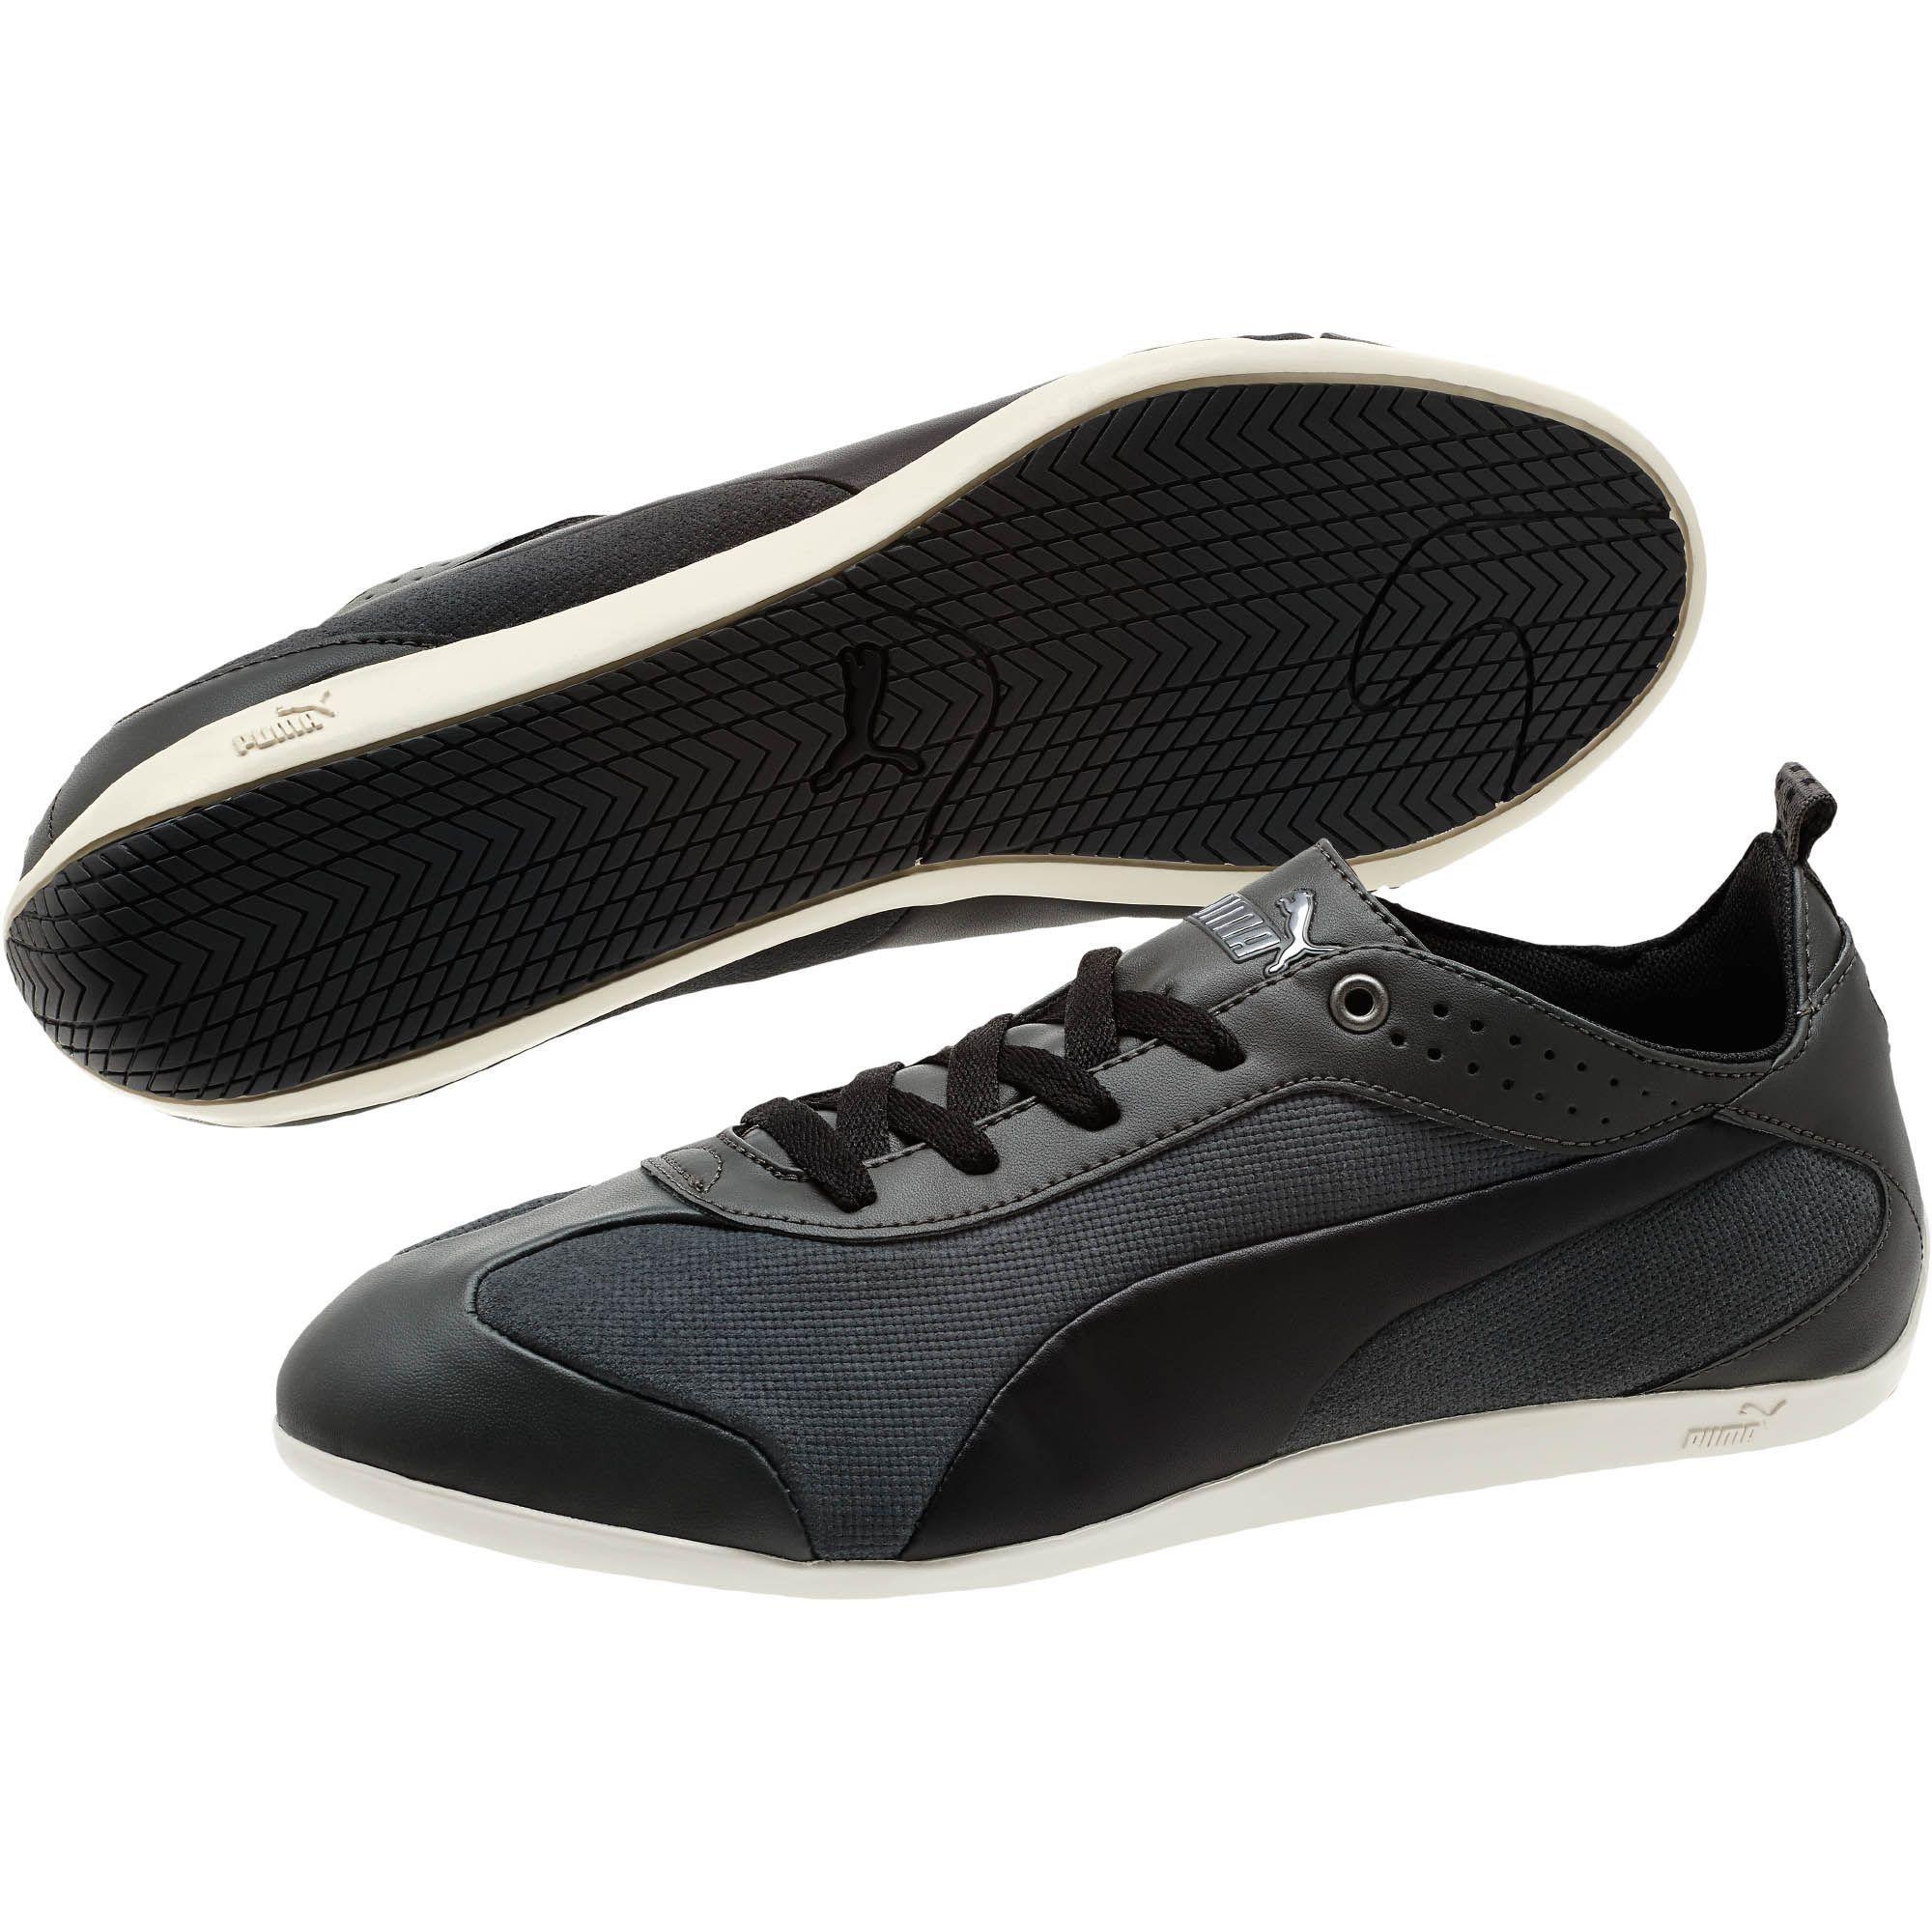 puma caro lo leather schuhe sneakers automotive m nner neu. Black Bedroom Furniture Sets. Home Design Ideas